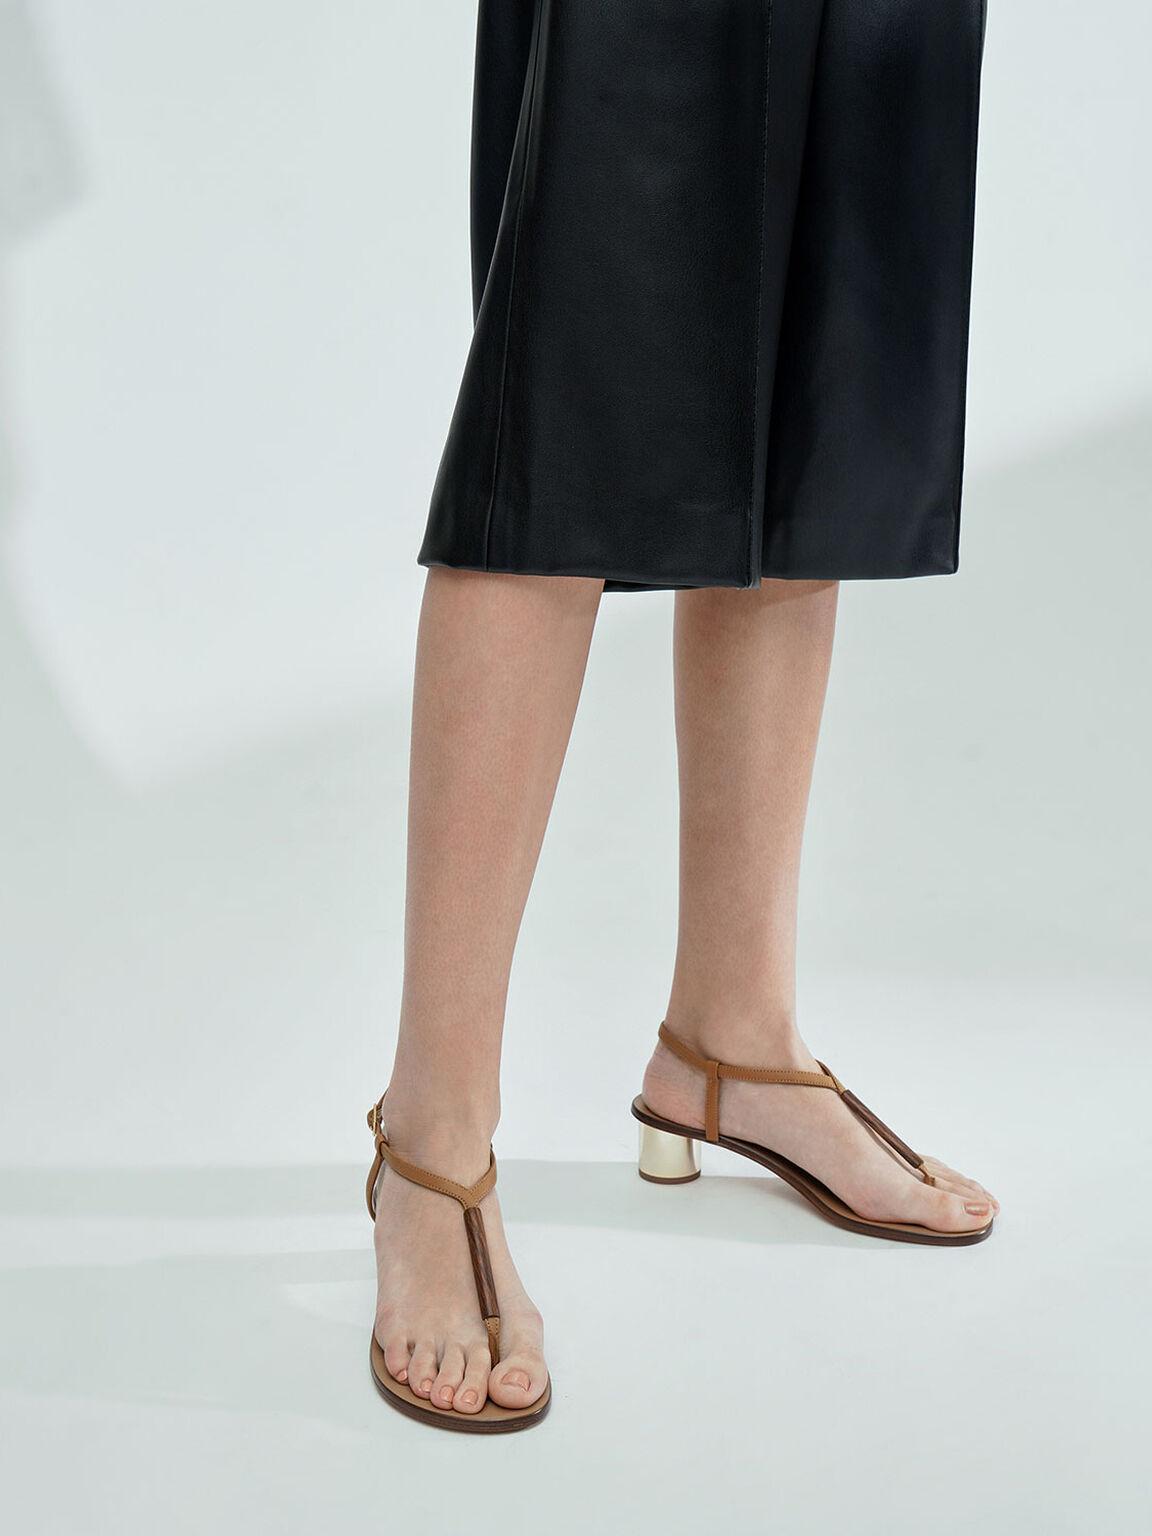 Chrome Heel Thong Sandals, Tan, hi-res